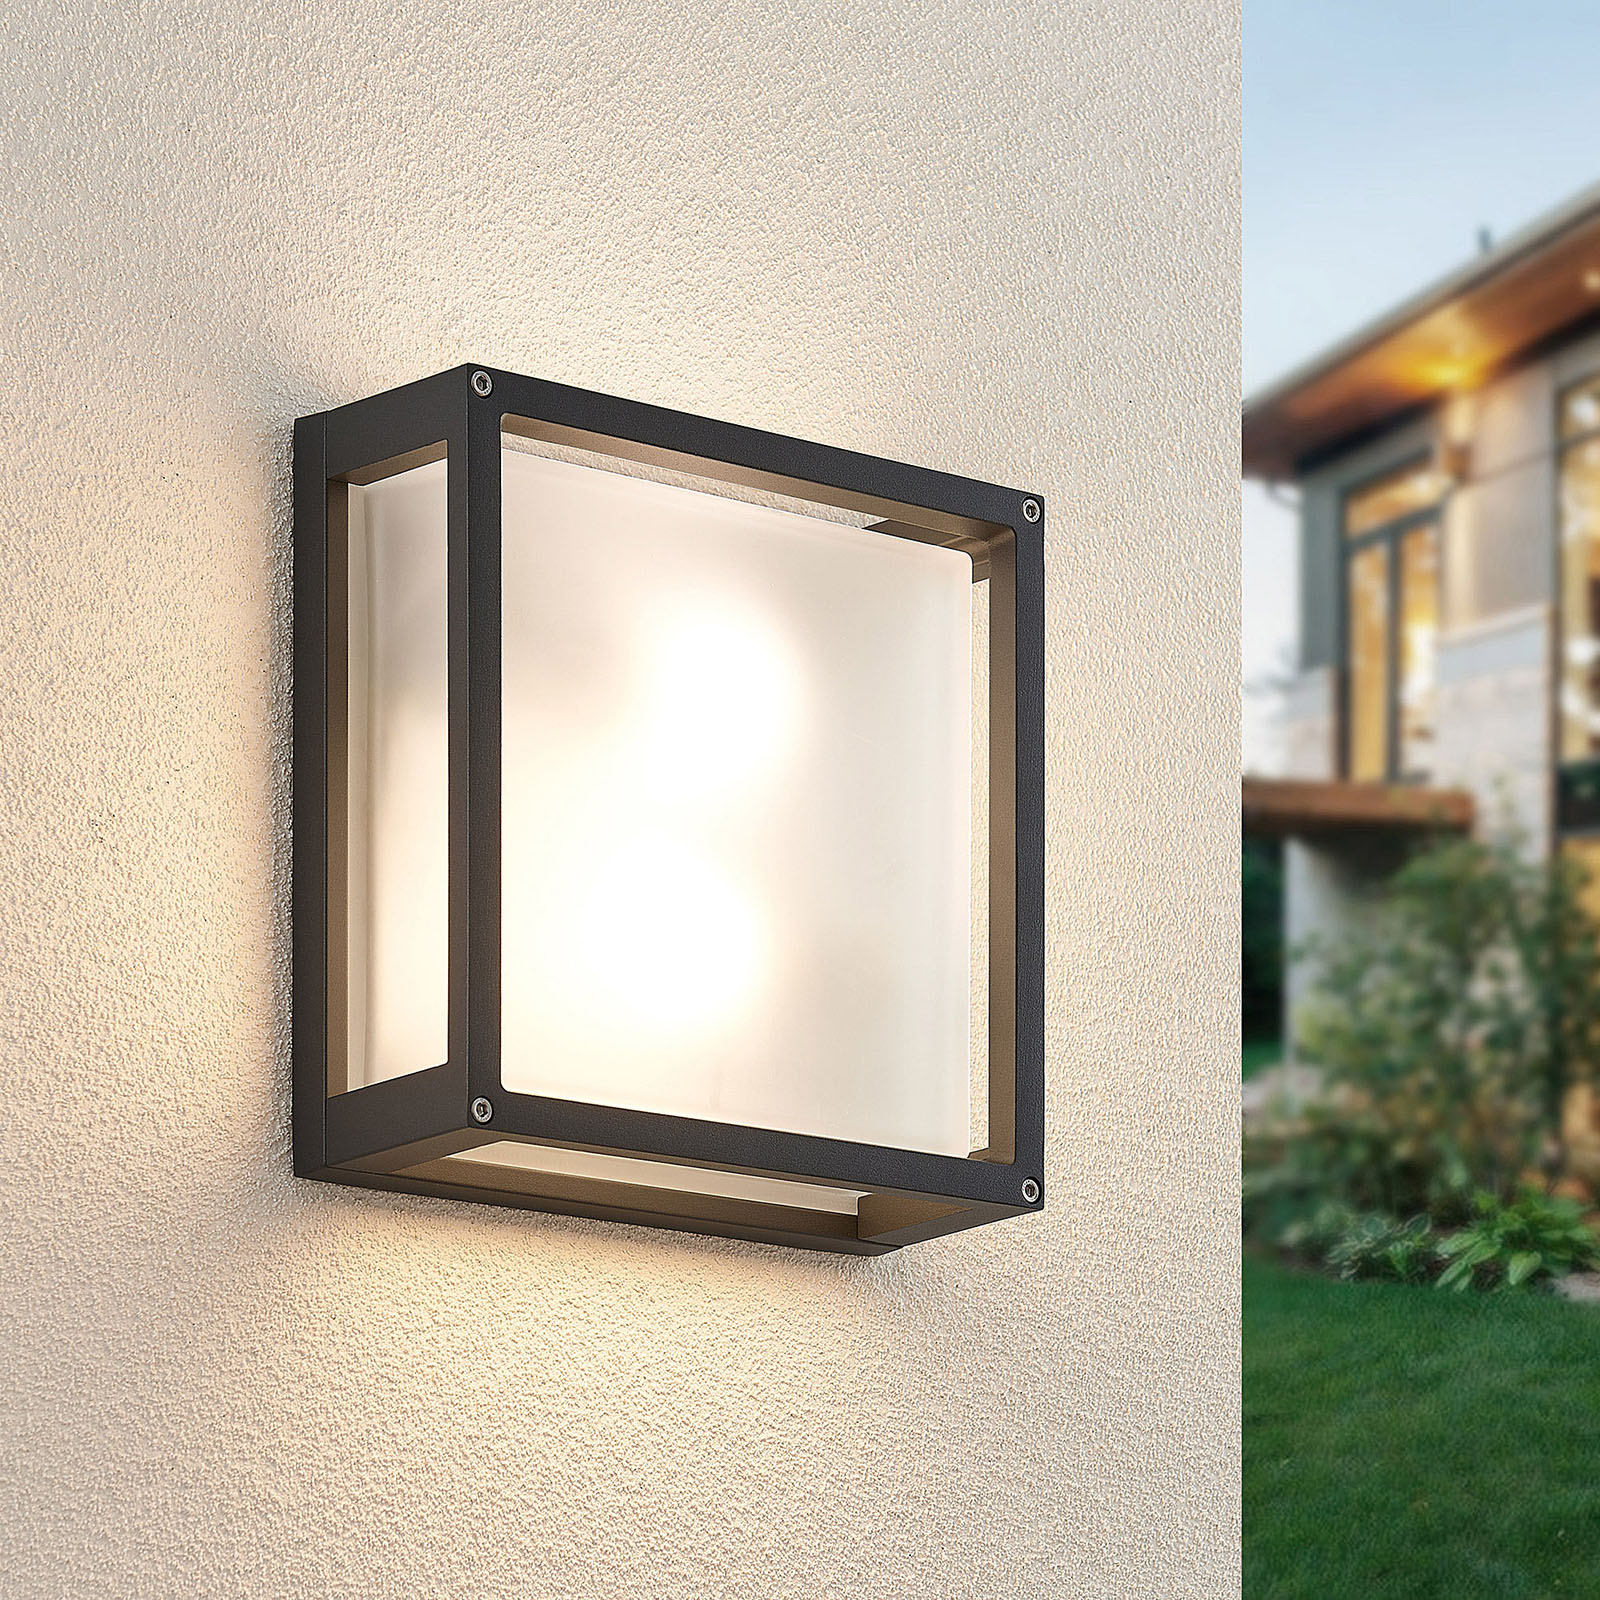 Aurelien square outdoor wall lamp_9969047_1